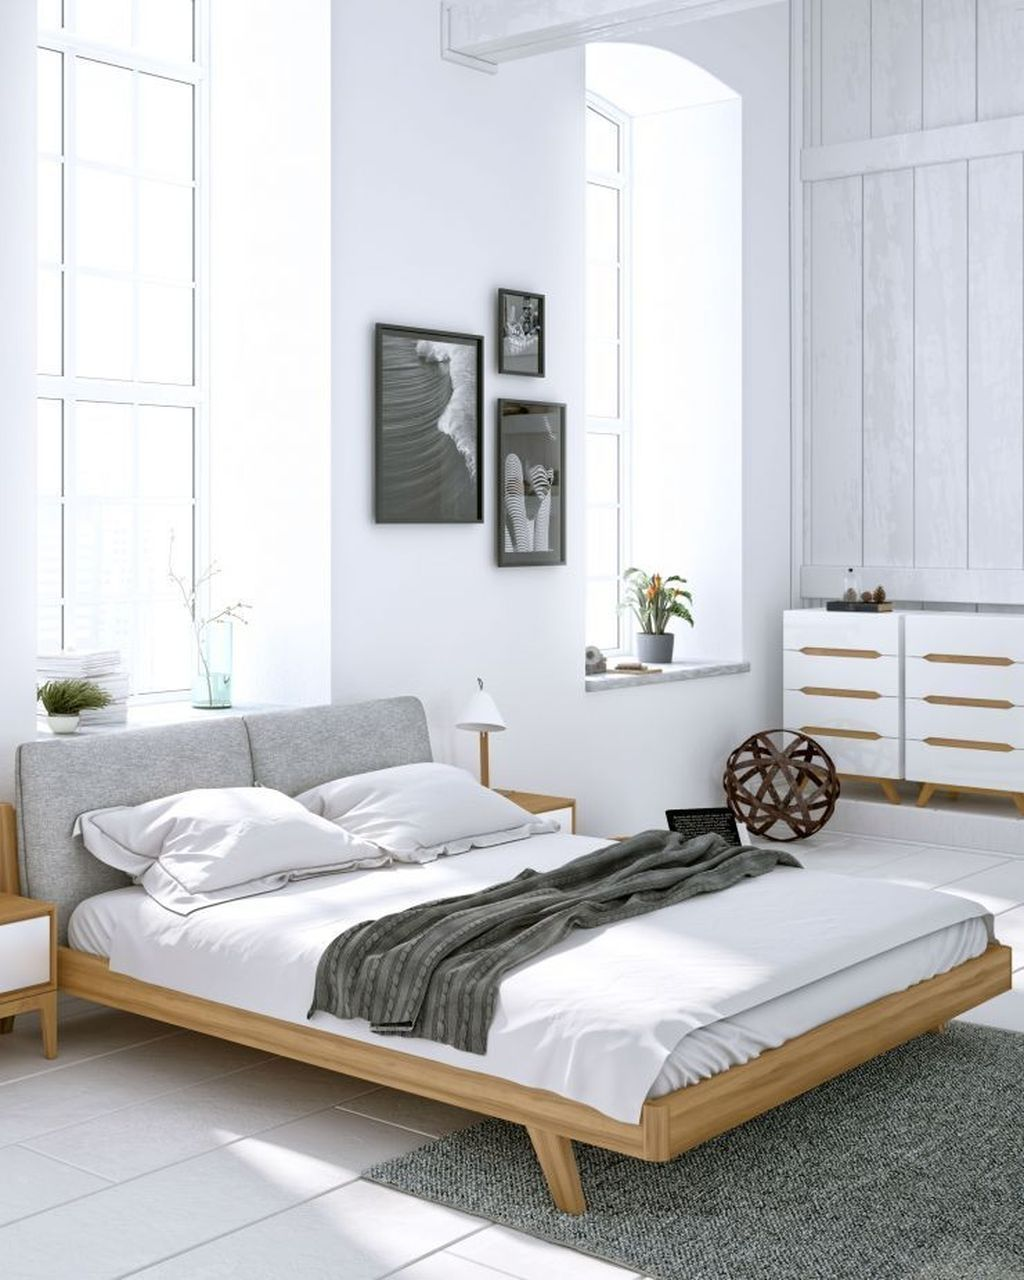 Latest bedroom interior design trends  cozy and minimalist bedroom design trends ideas  home